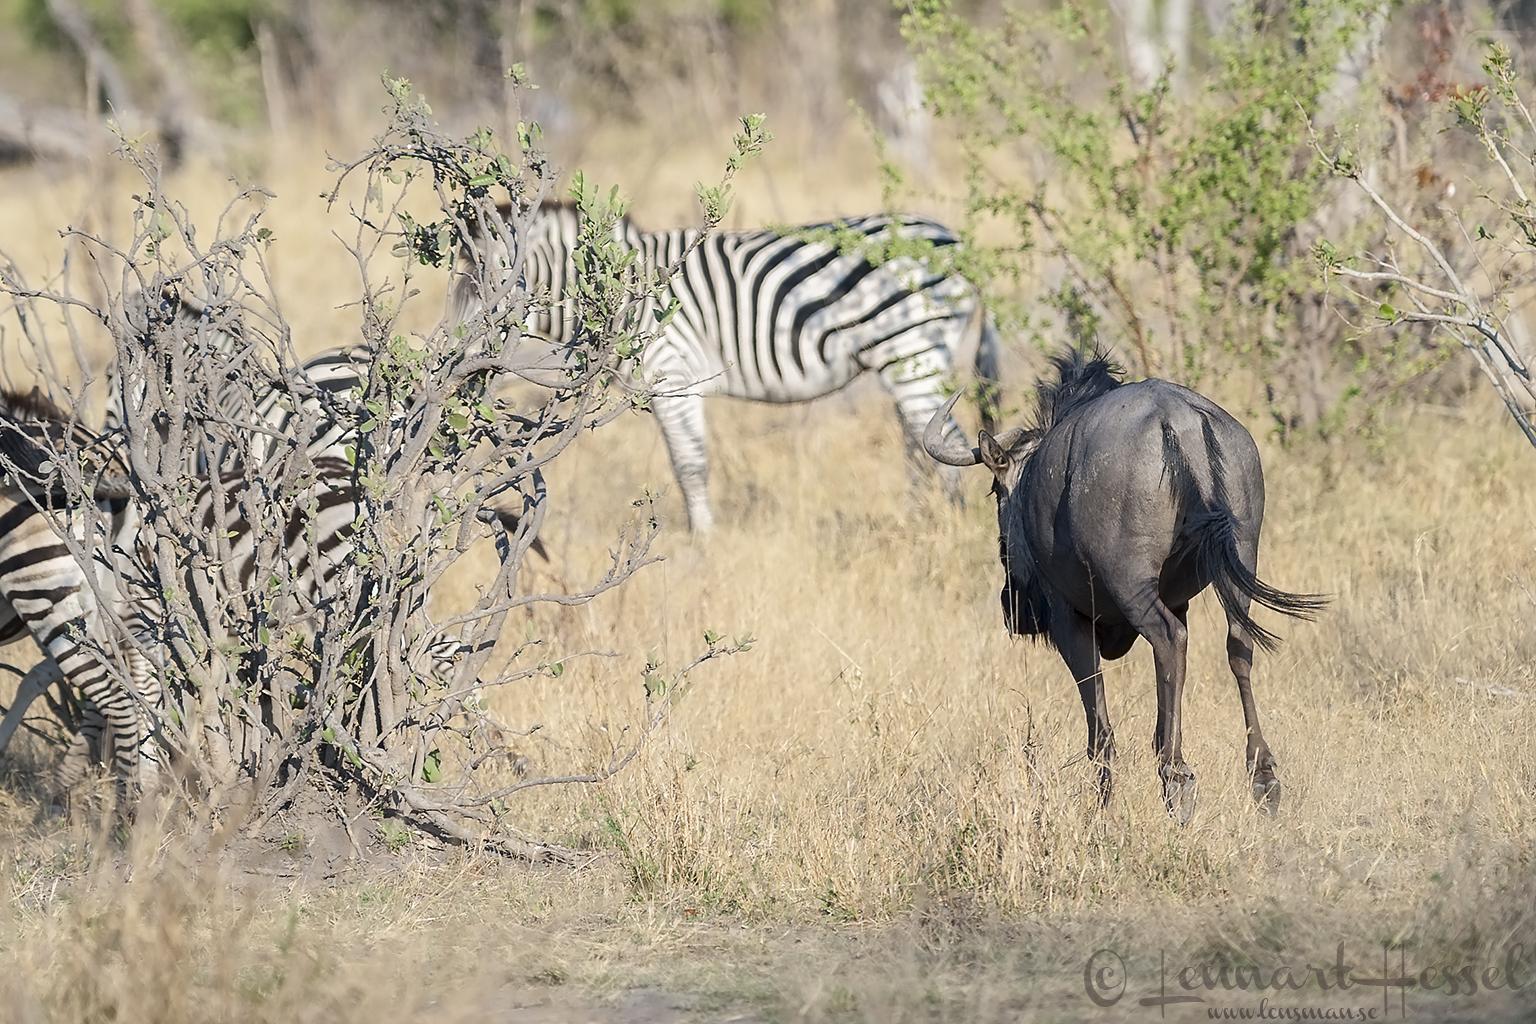 Blue Wildebeest & Zebras in Khwai Community Area, Botswana